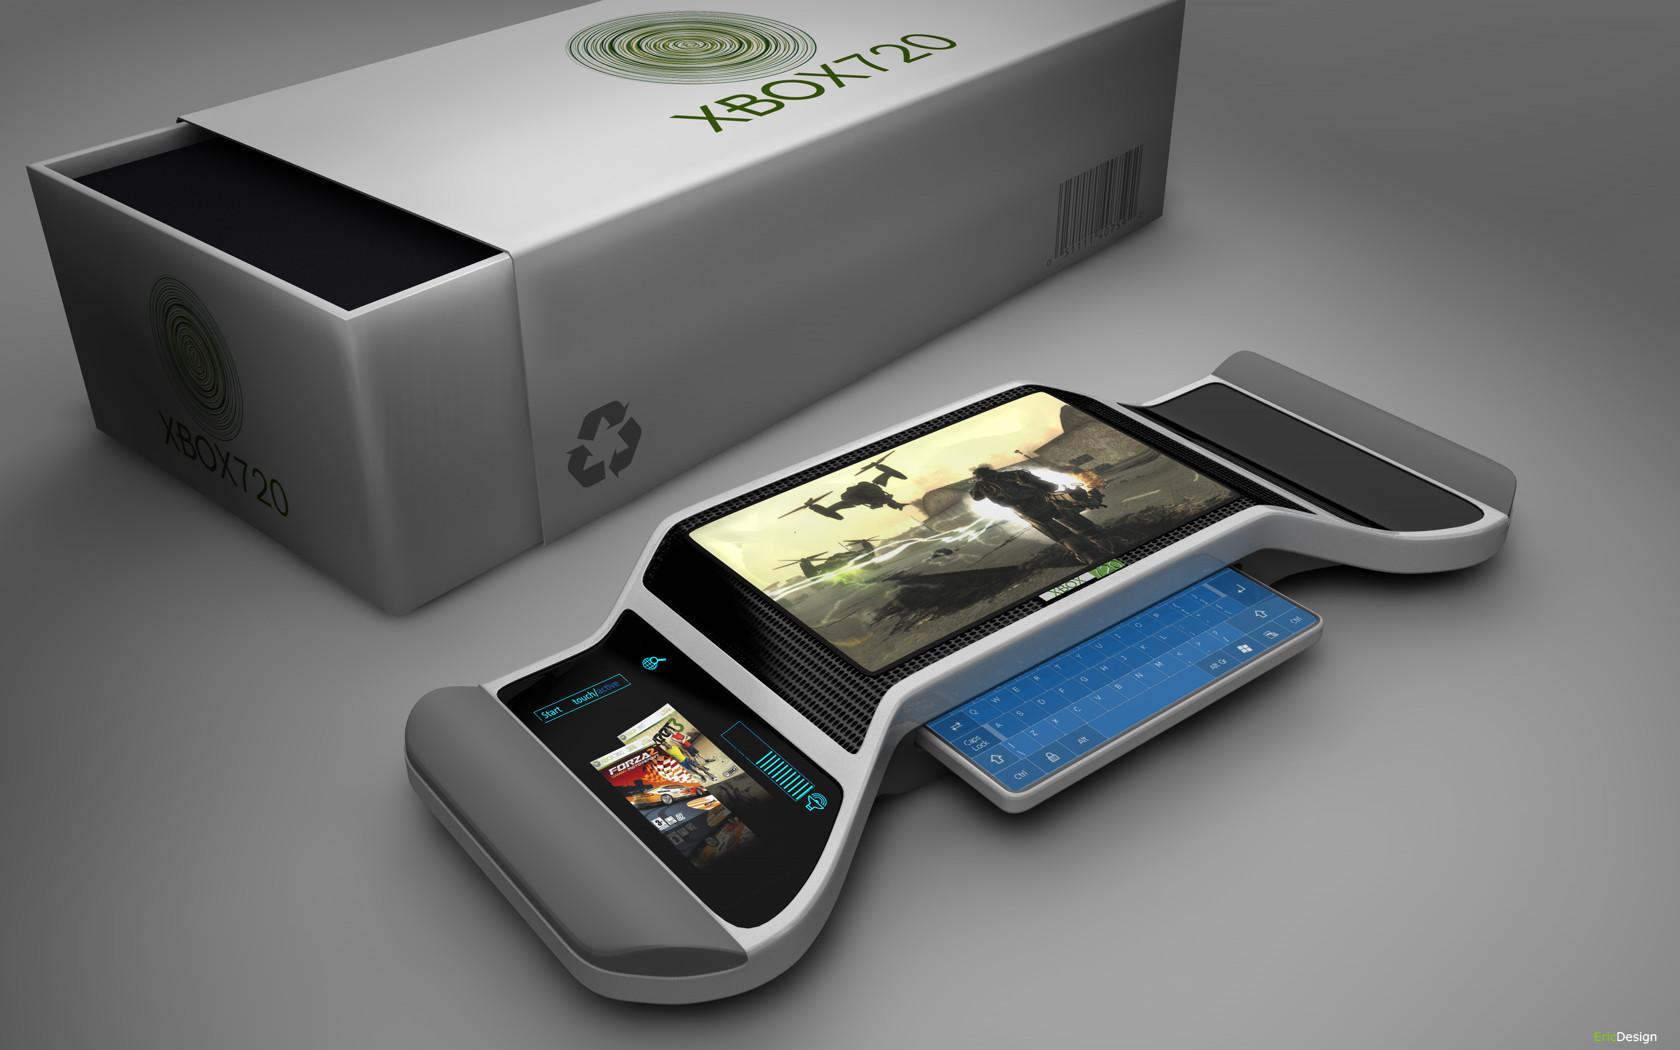 1354458148_xbox720-concept.jpg